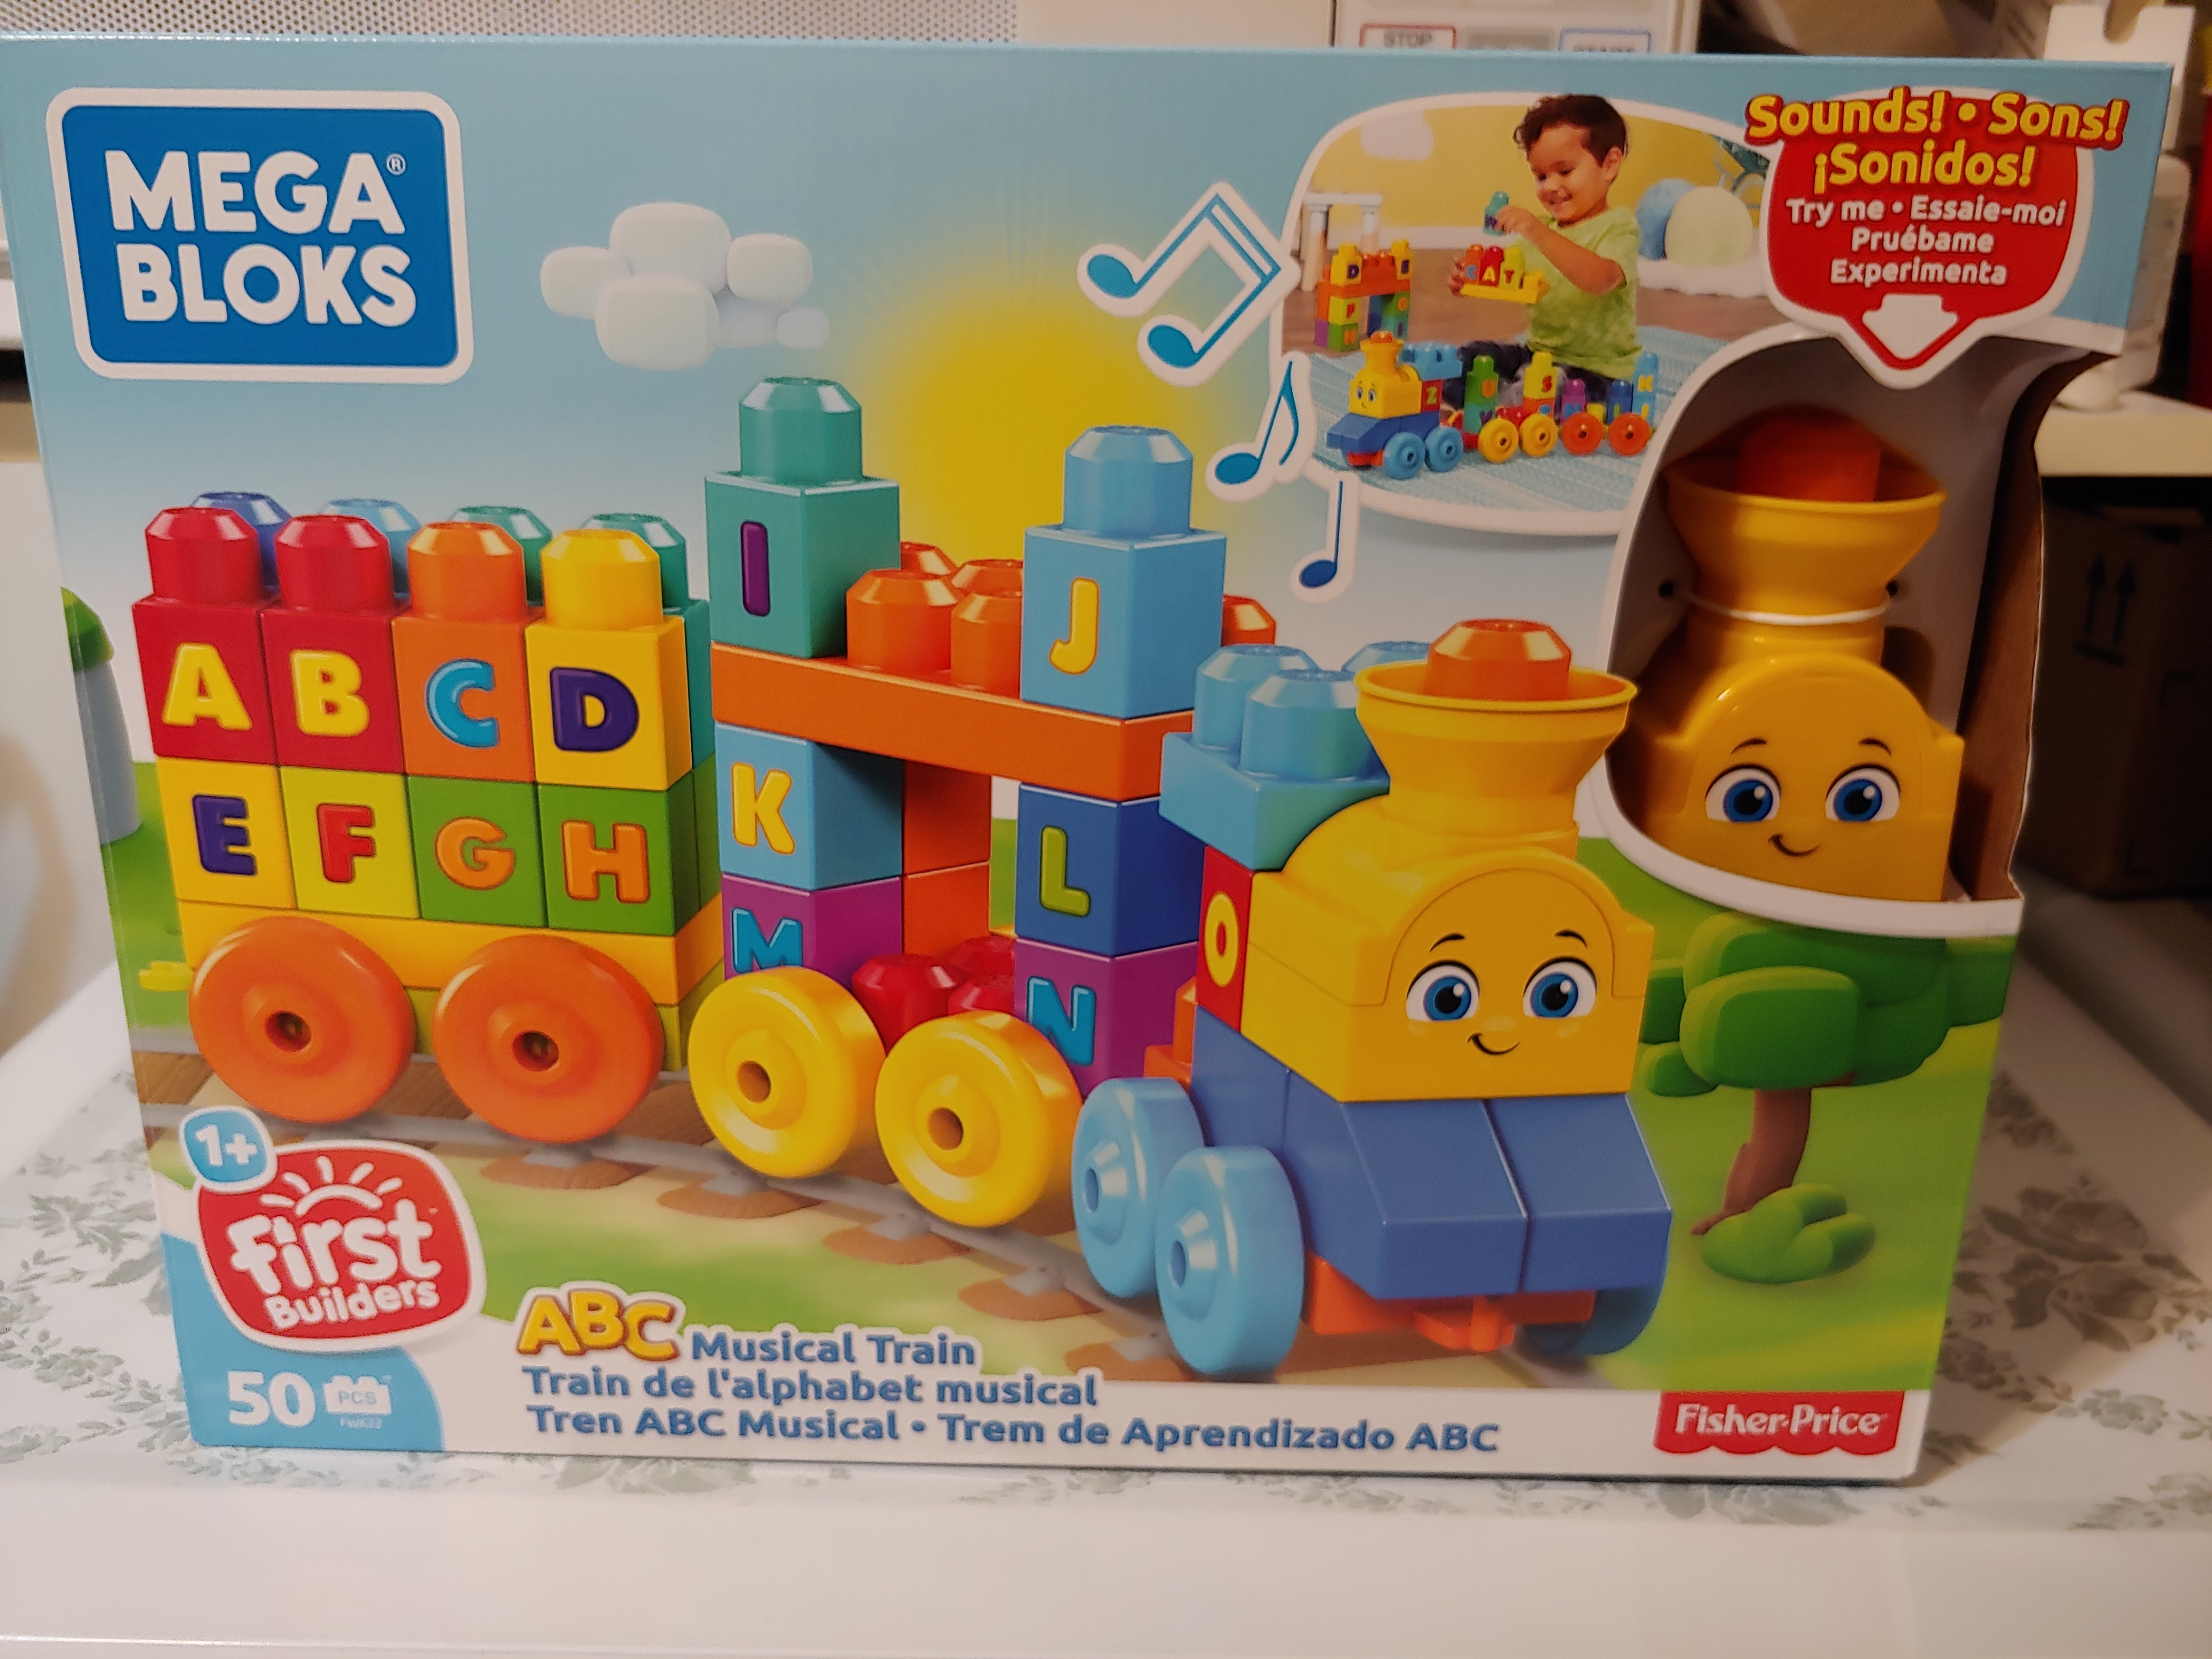 Mega Bloks ABC Musical Train Building Set reviews in Toys